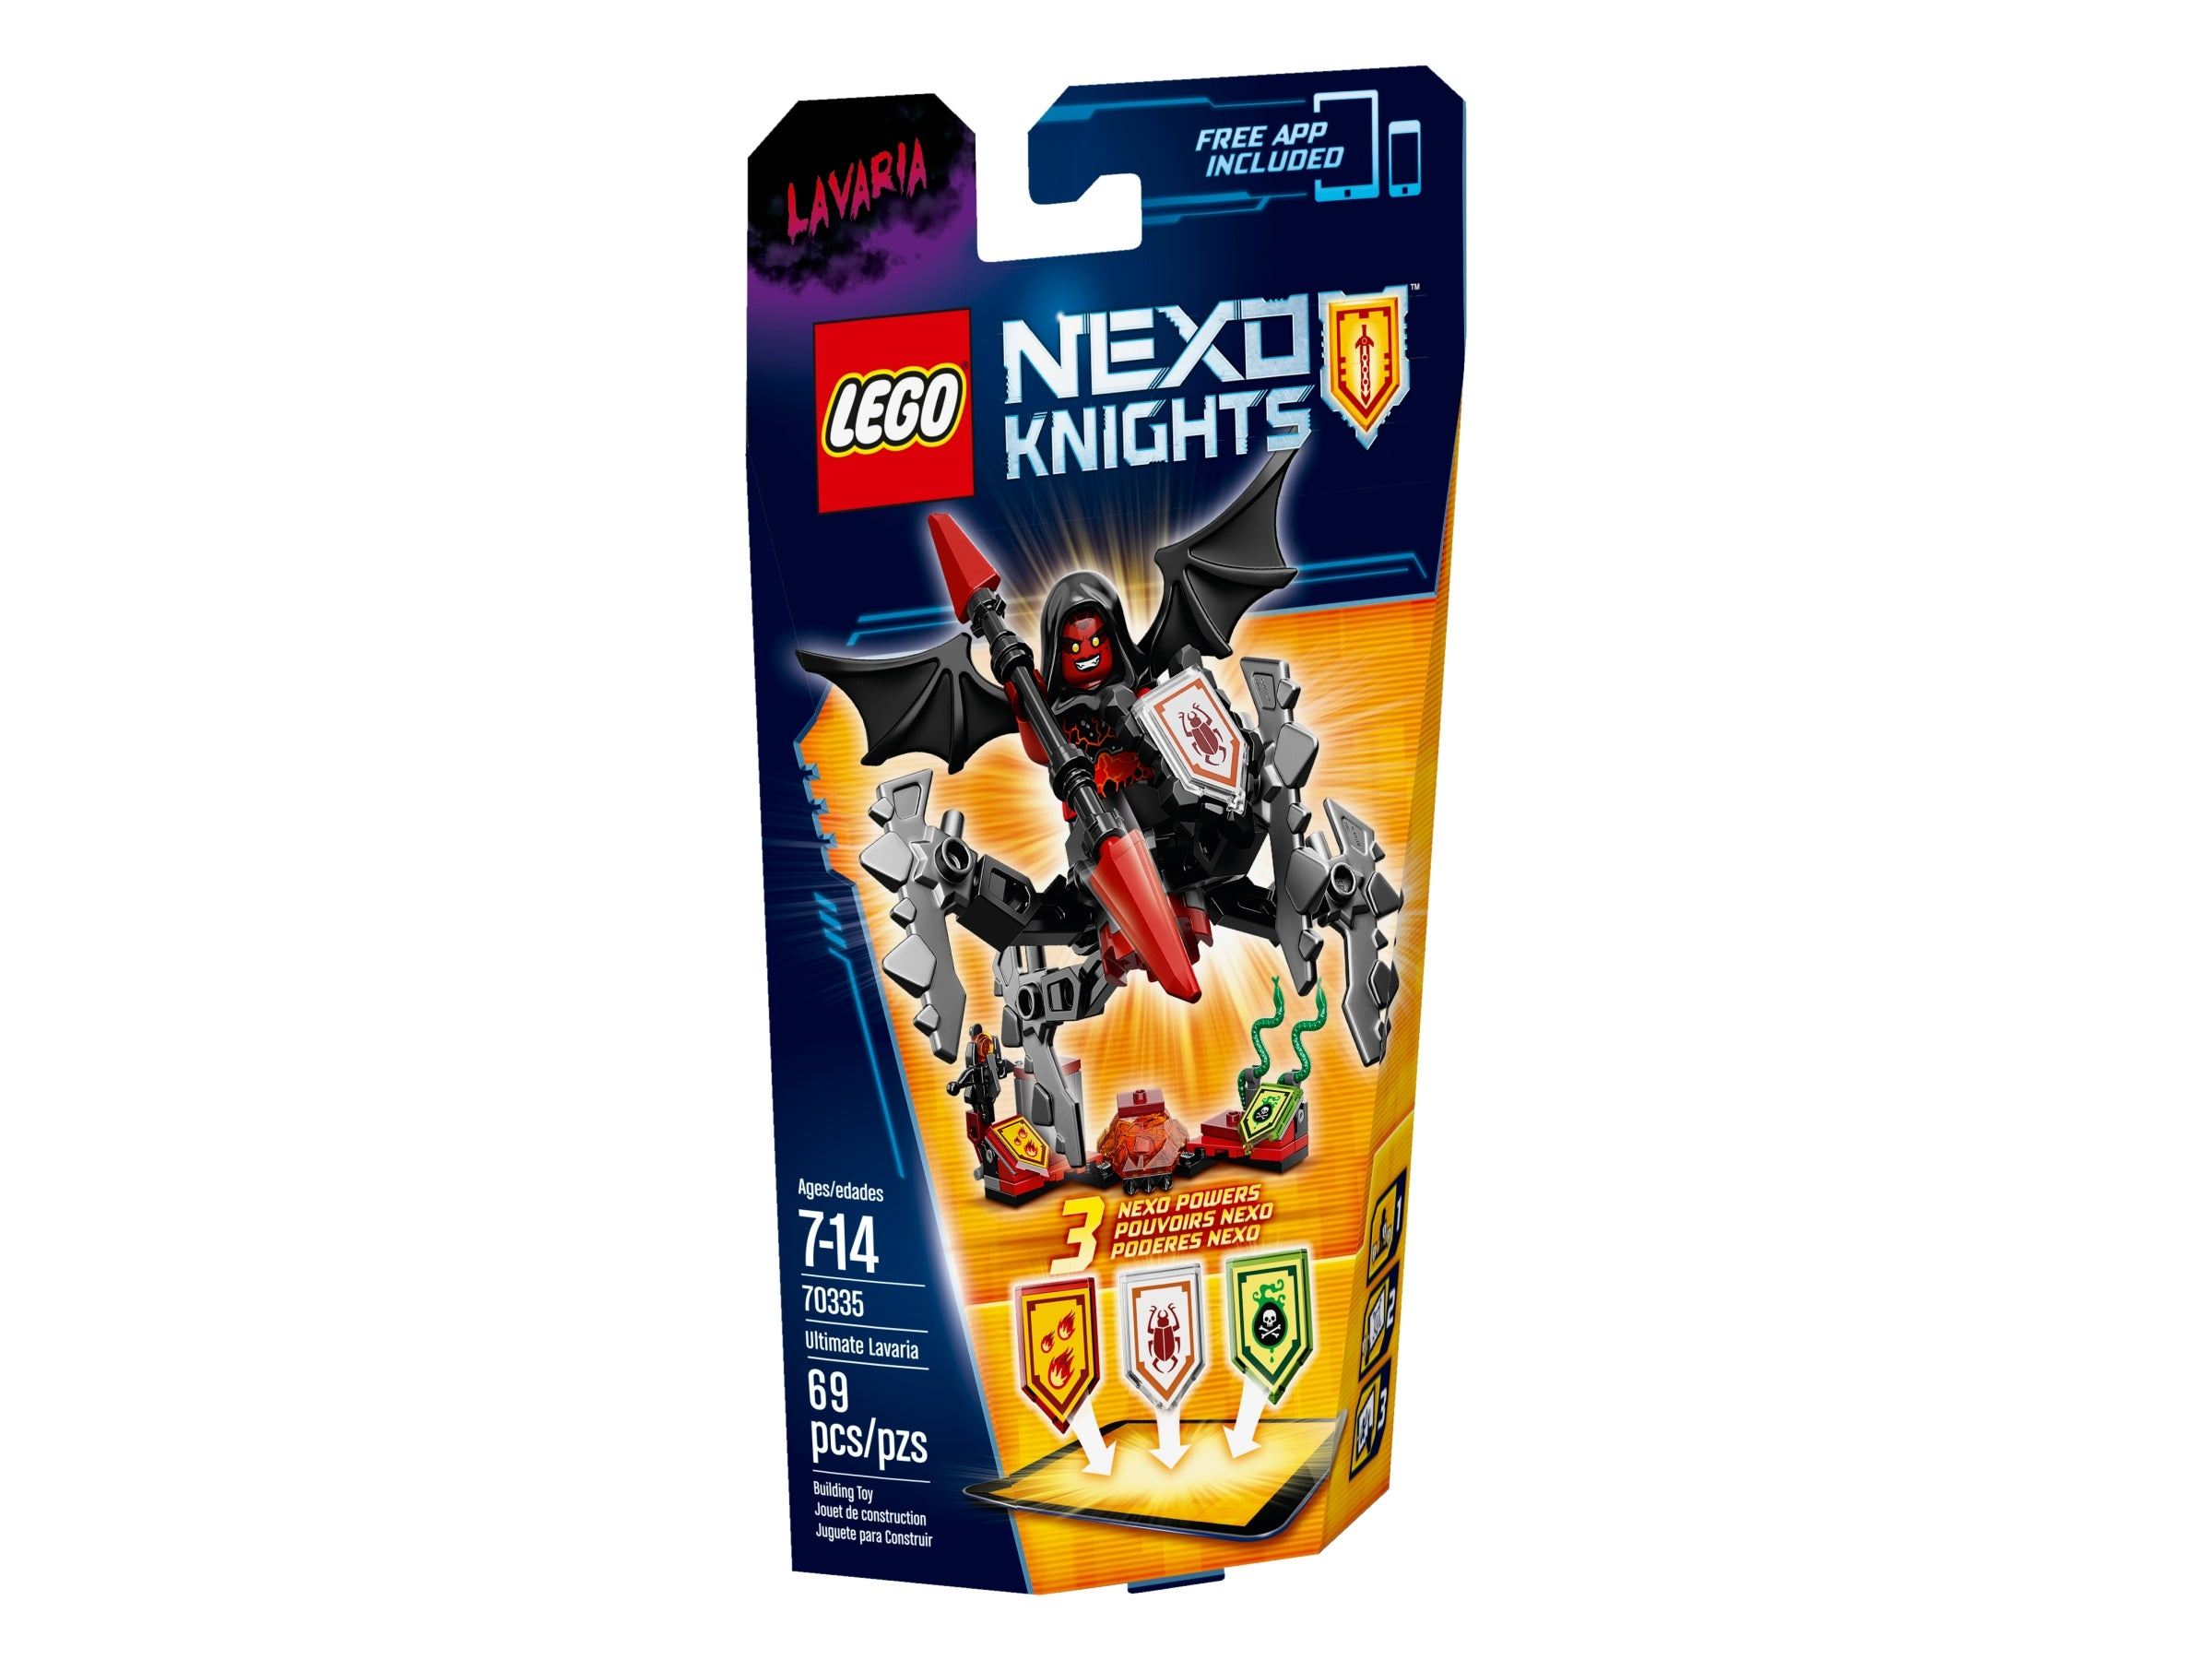 NEW LEGO Lavaria FROM SET 70335 NEXO KNIGHTS NEX030